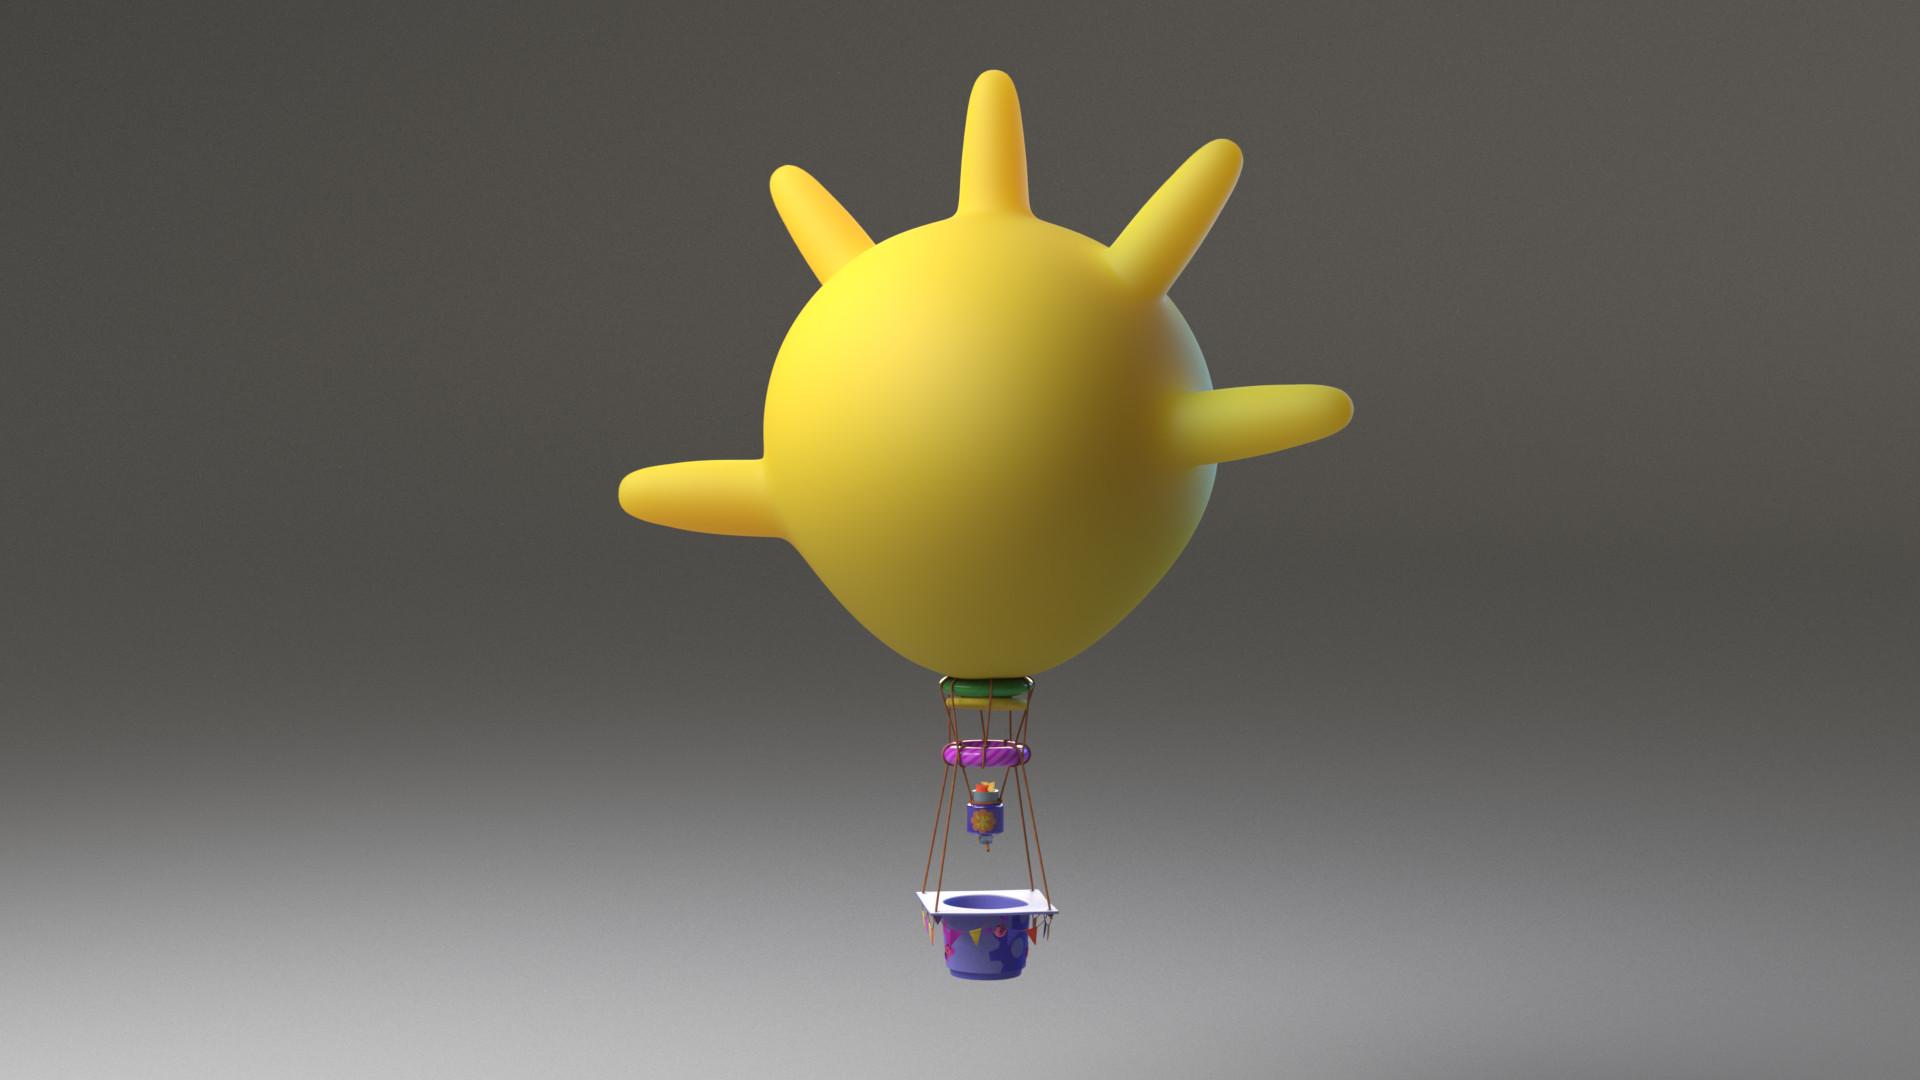 artstation - hot air balloon, zoe lane